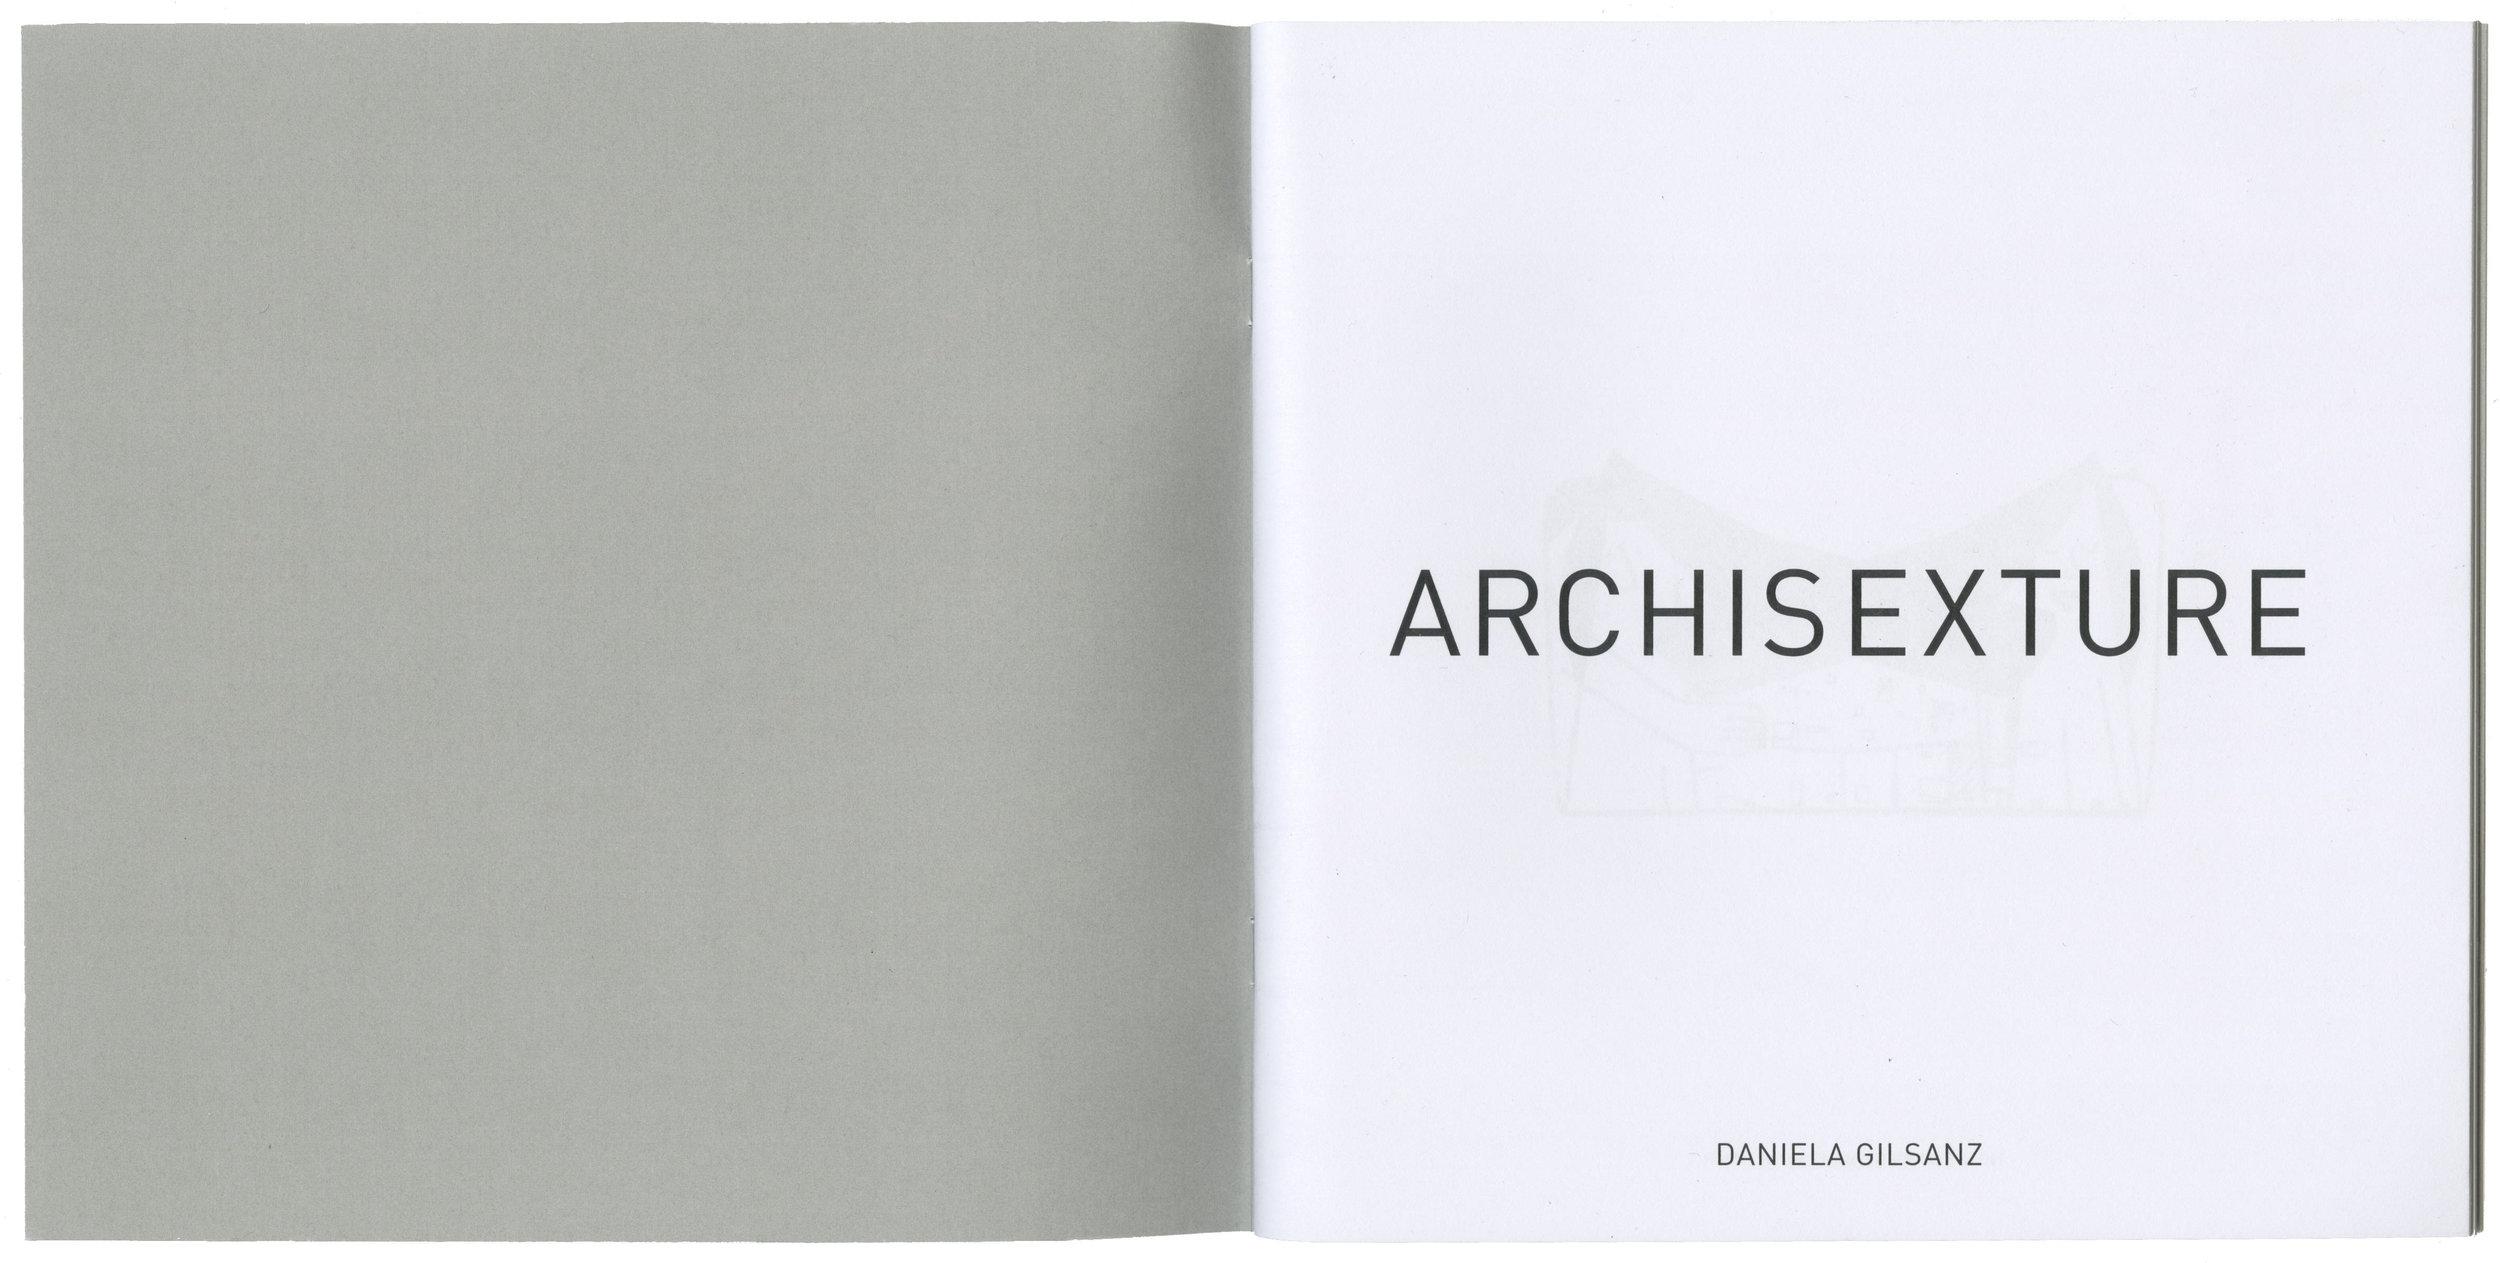 archisex-title.jpg